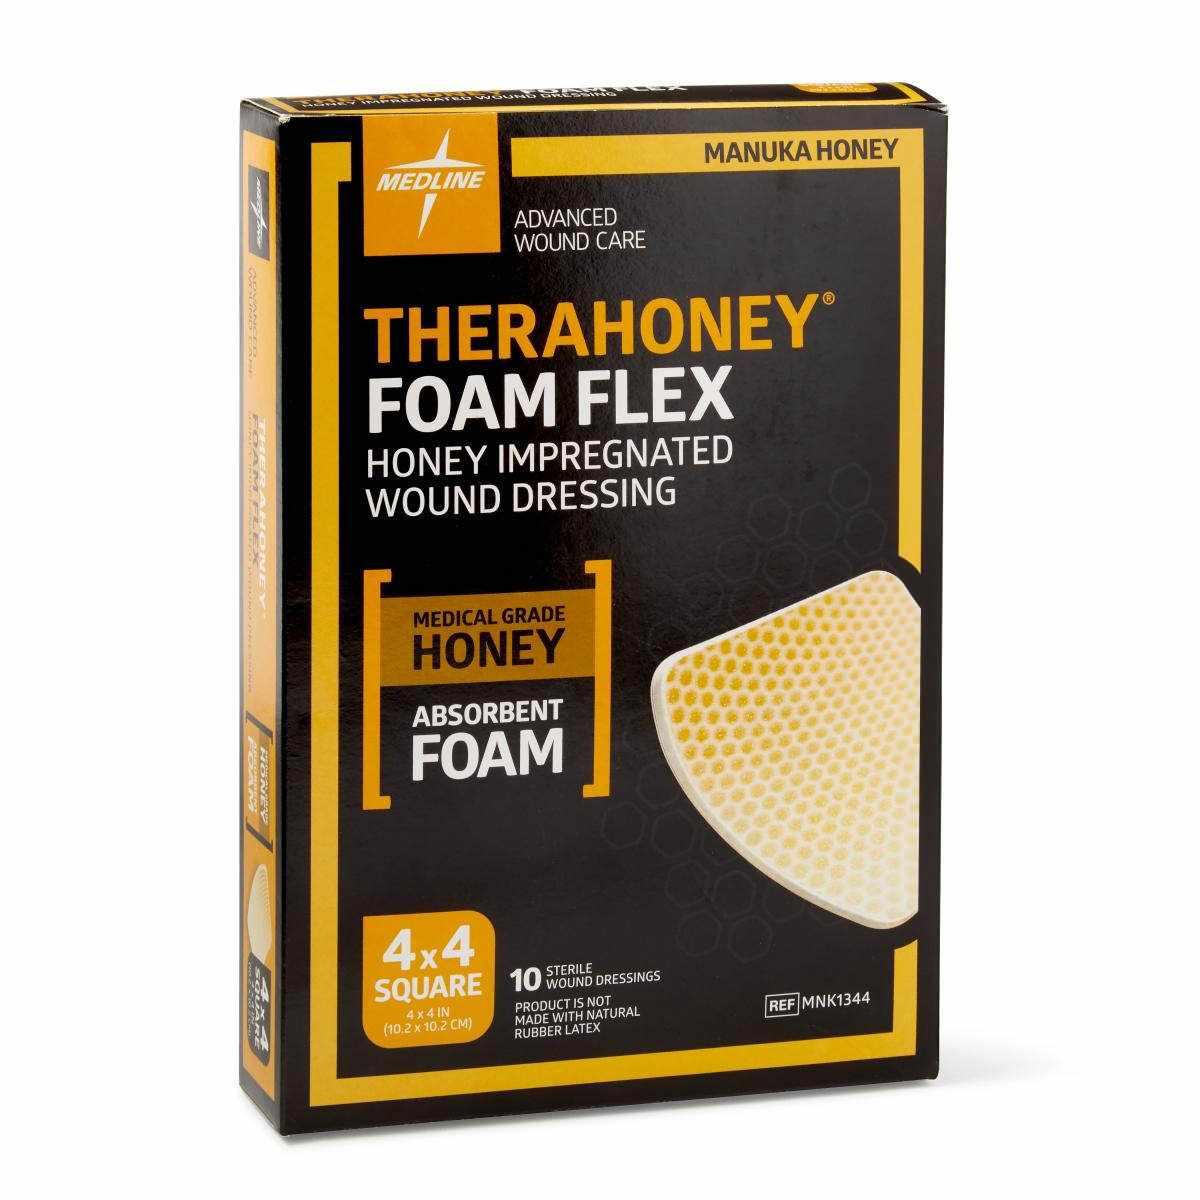 "Medline TheraHoney Foam Flex Honey-Impregnated Wound Dressing, 4 x 4"""